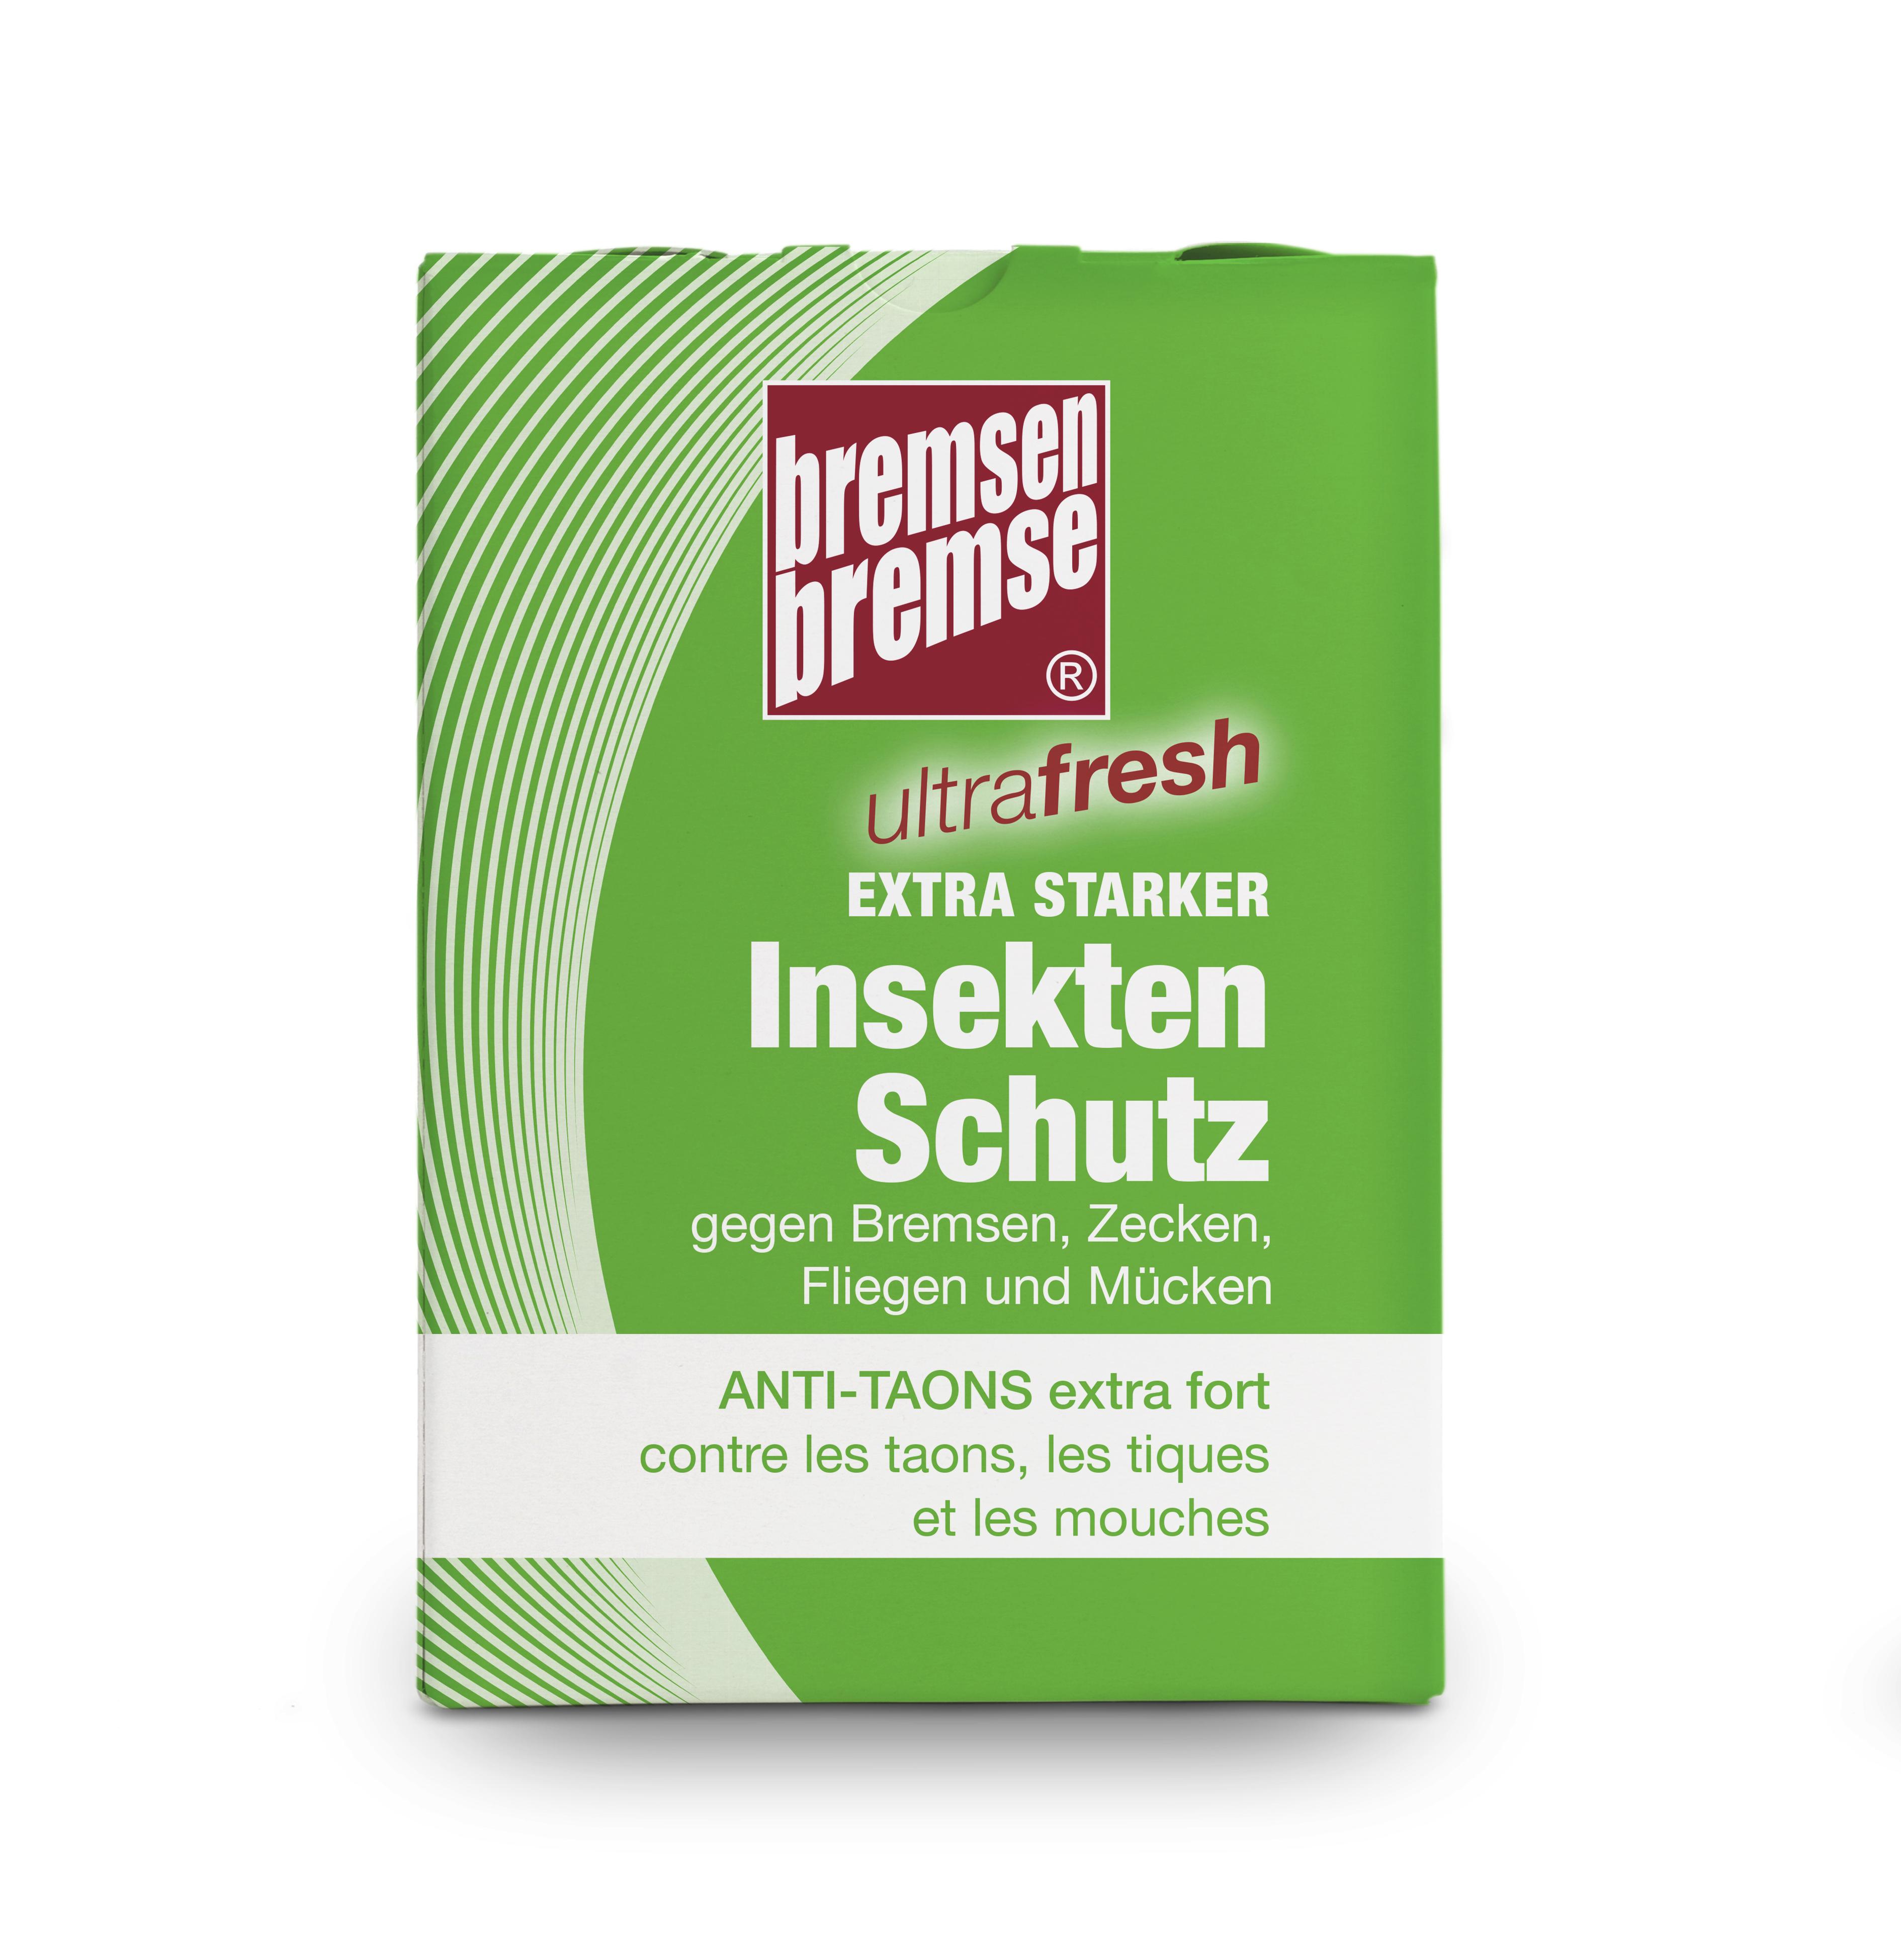 Zedan 2L Bremsen-Bremse Ultrafresh Bag-in-Box